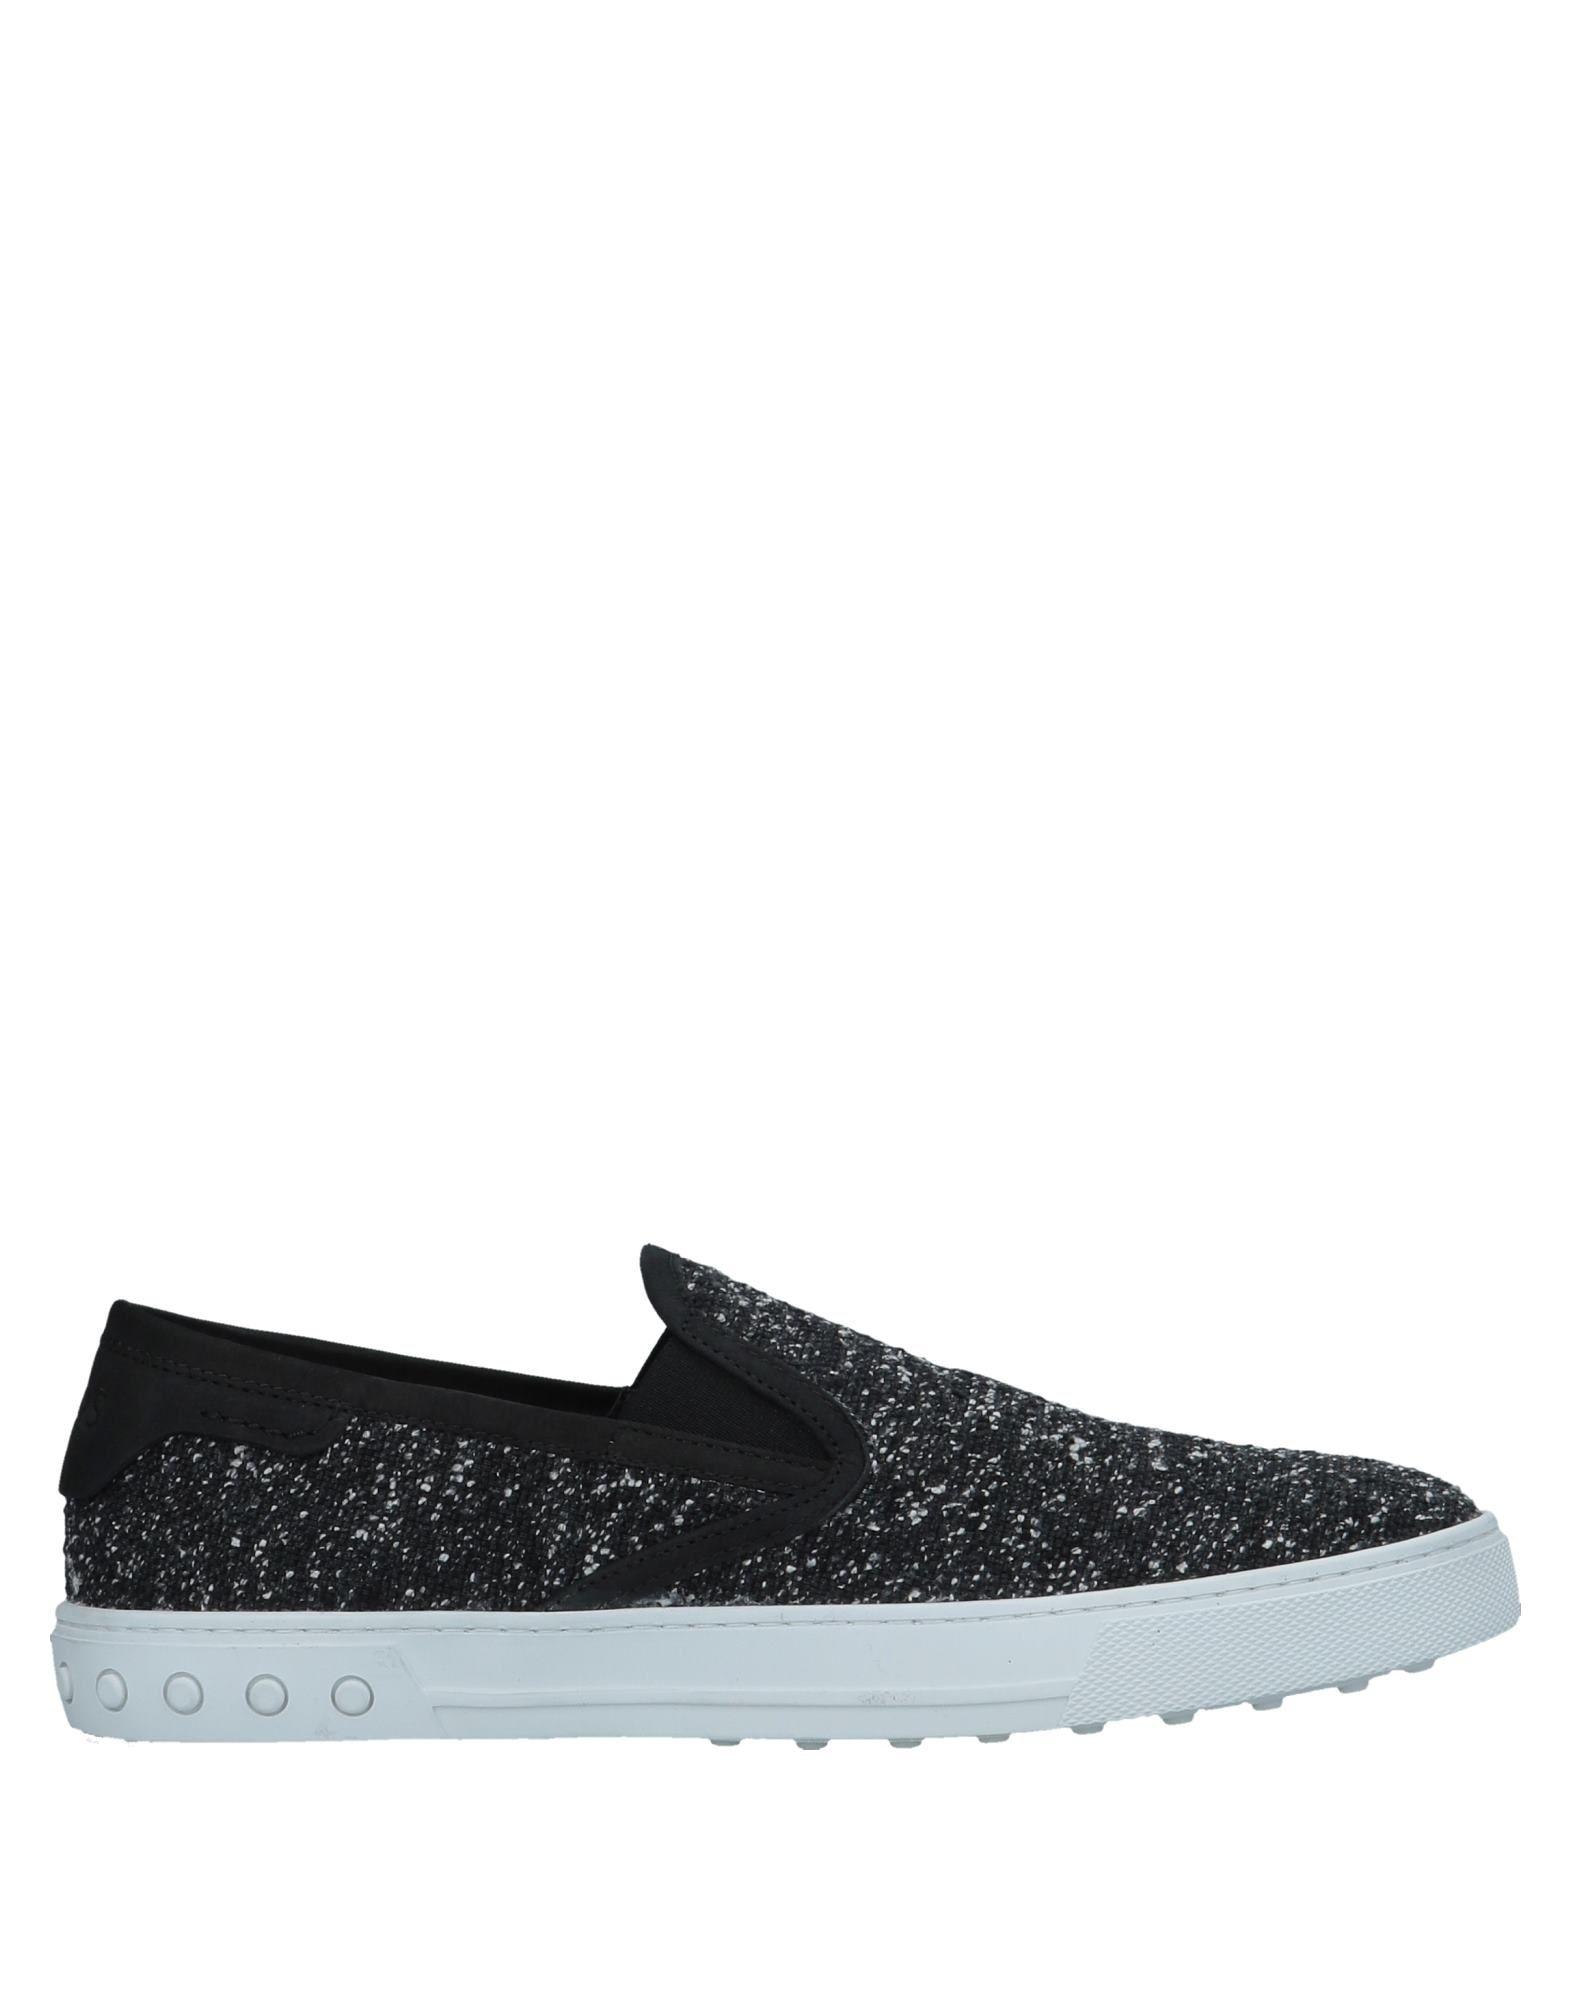 Tod's Gute Sneakers Herren  11542475XB Gute Tod's Qualität beliebte Schuhe f65041